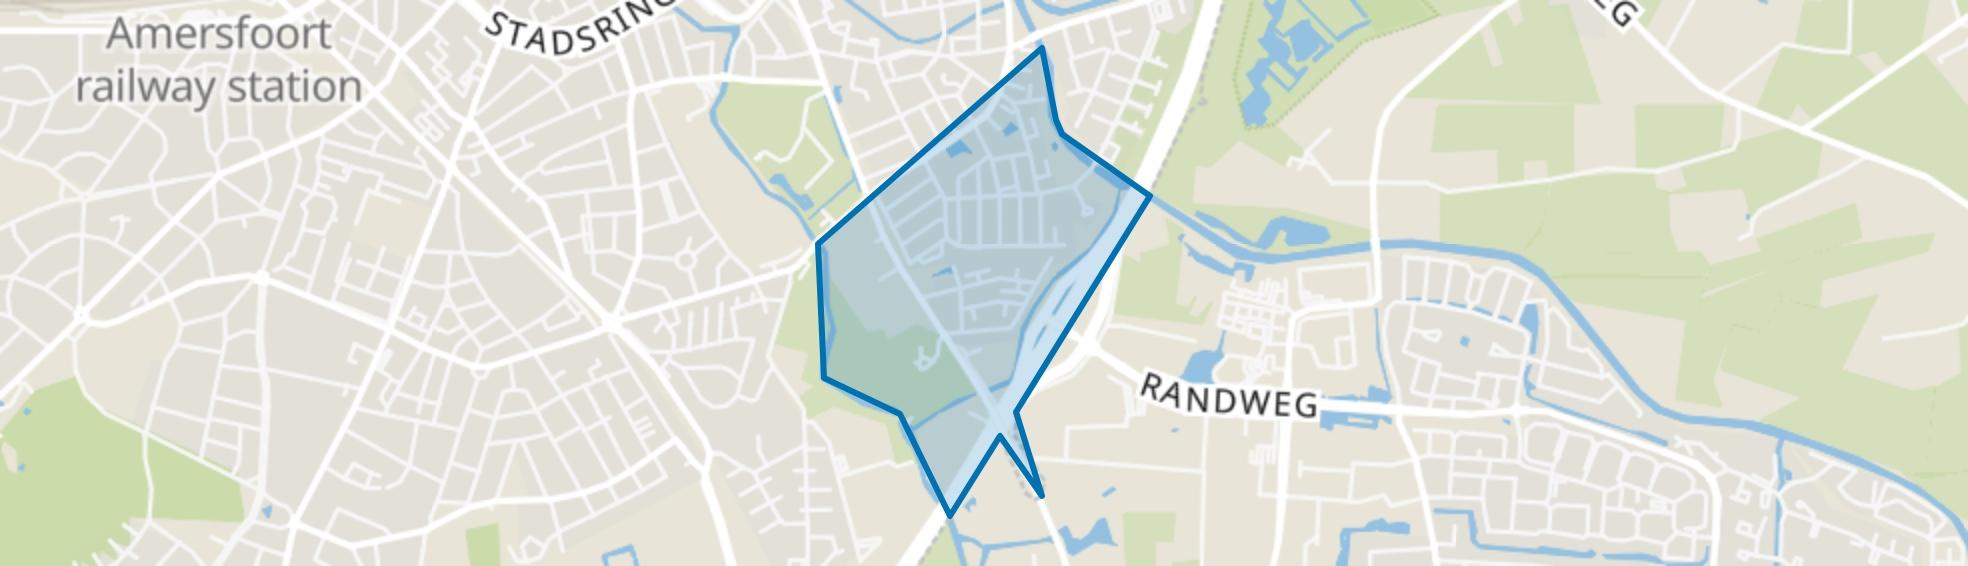 Weberstraat, Amersfoort map